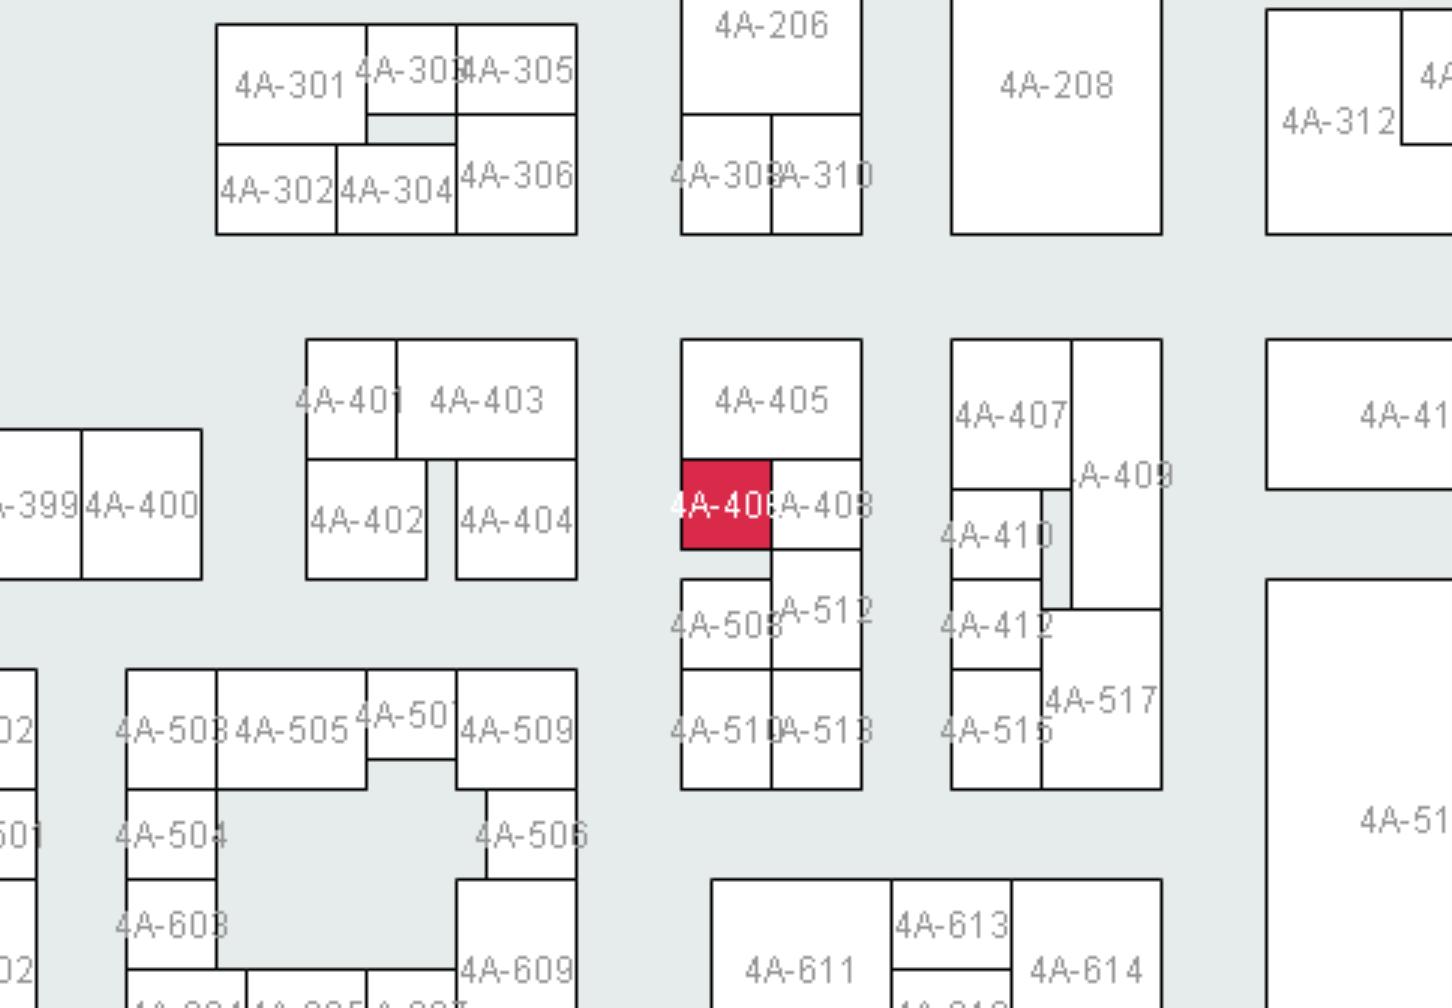 4A / 4A-406